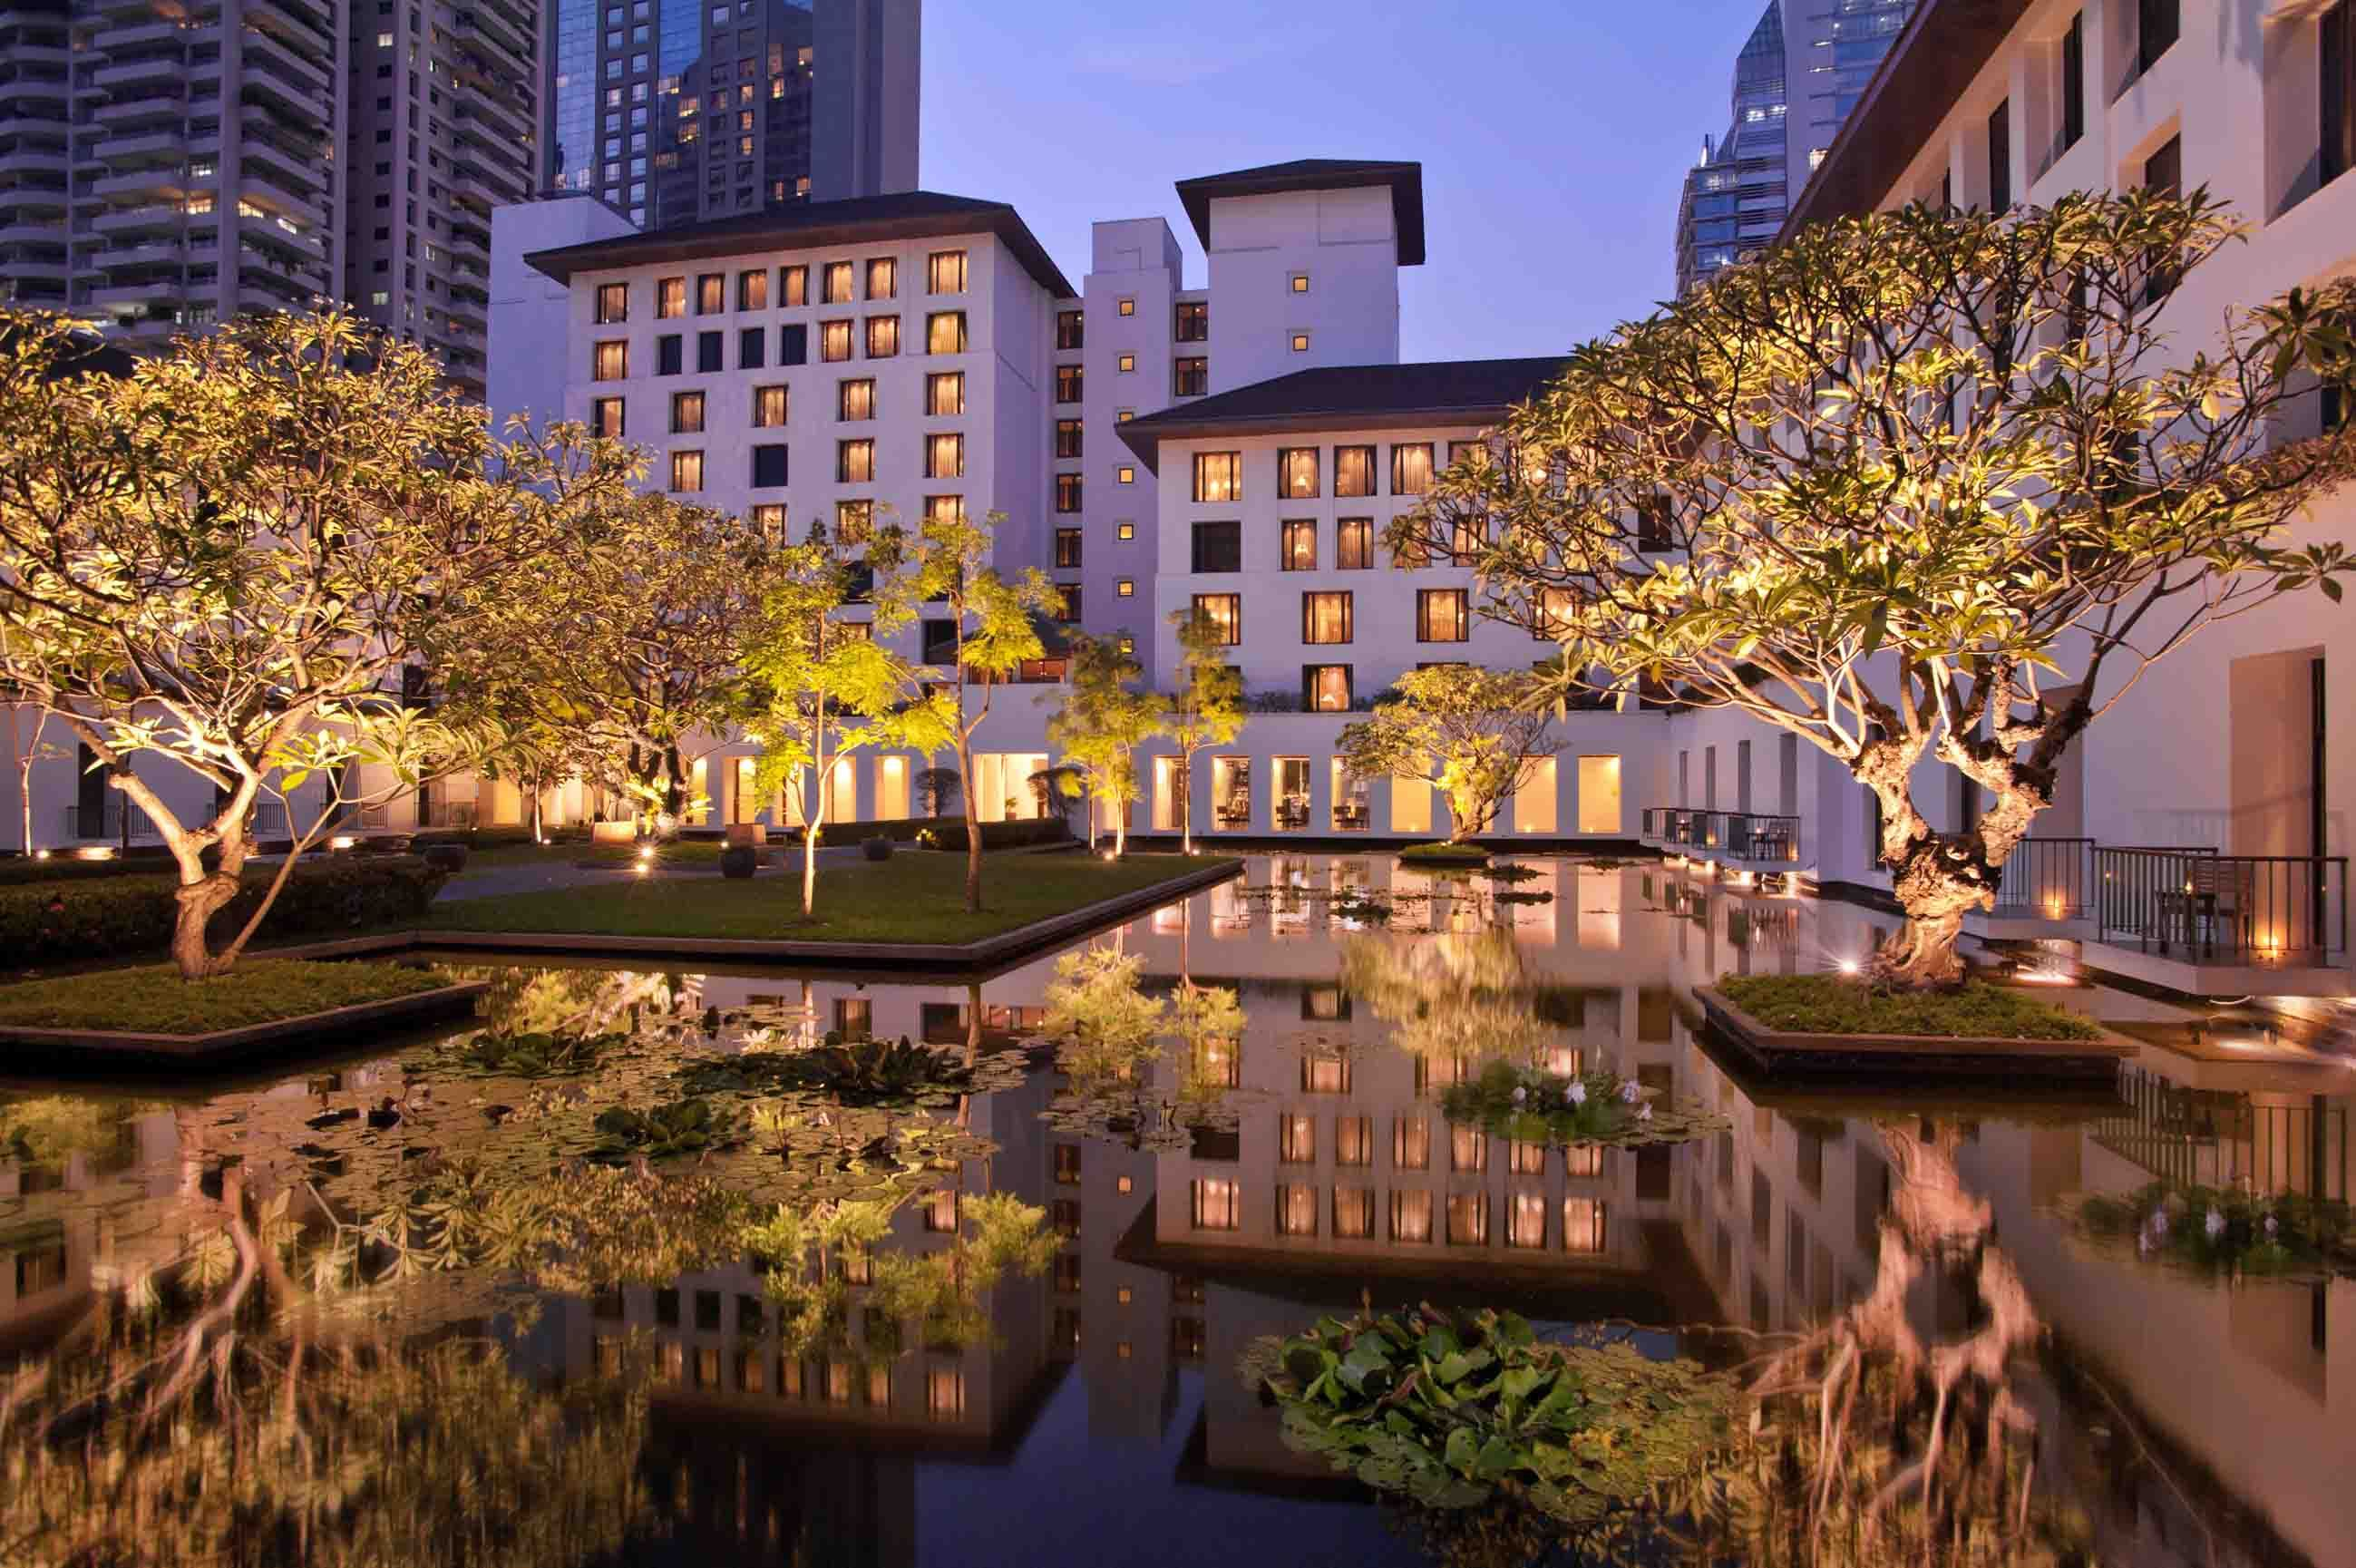 siam kempinski hotel u2013 garden courtyard night http www